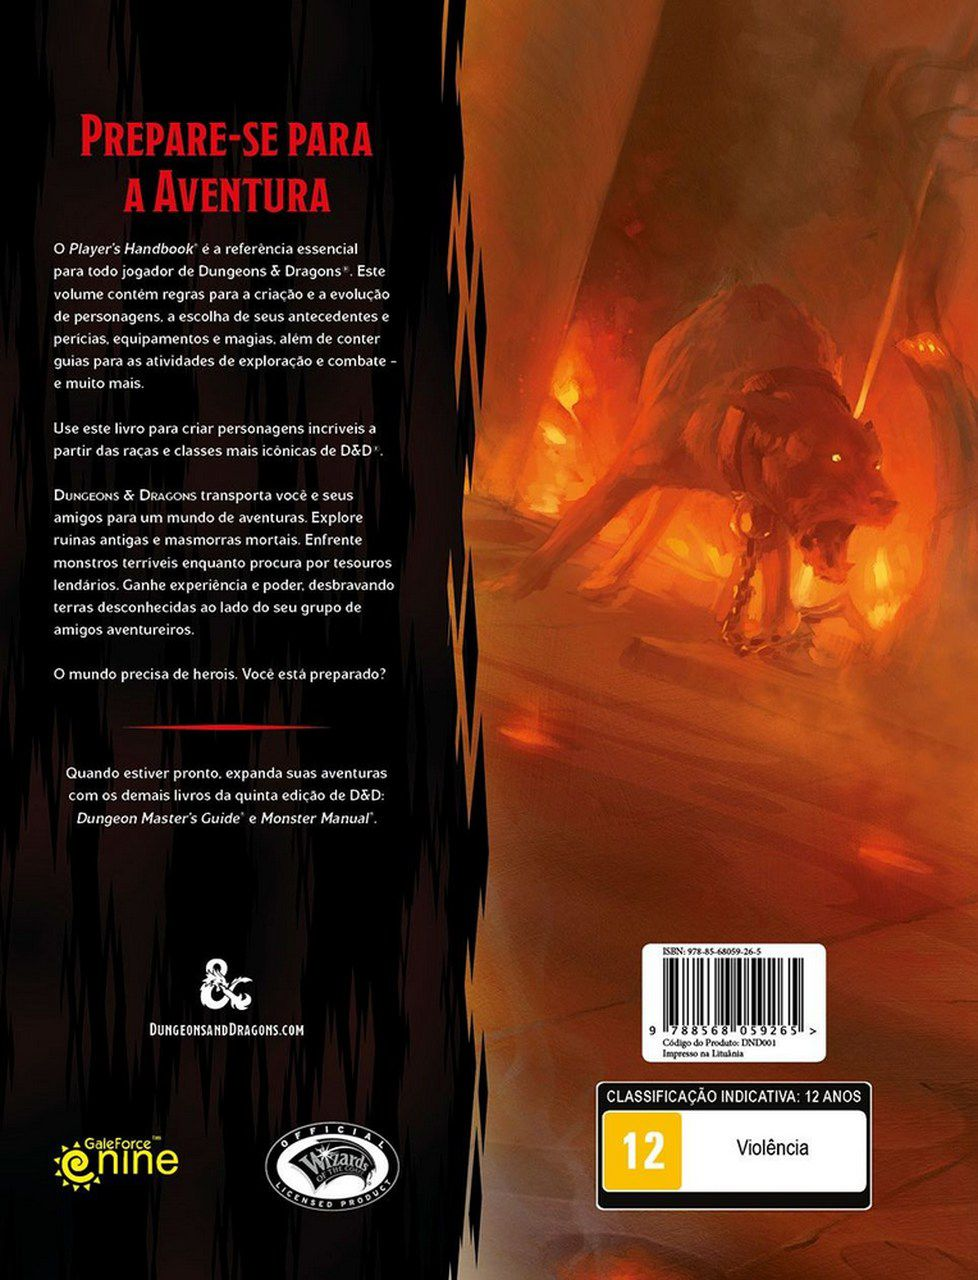 Dungeons and Dragons Player's Handbook (5ª Edição) (Board Games) - Galápagos Jogos